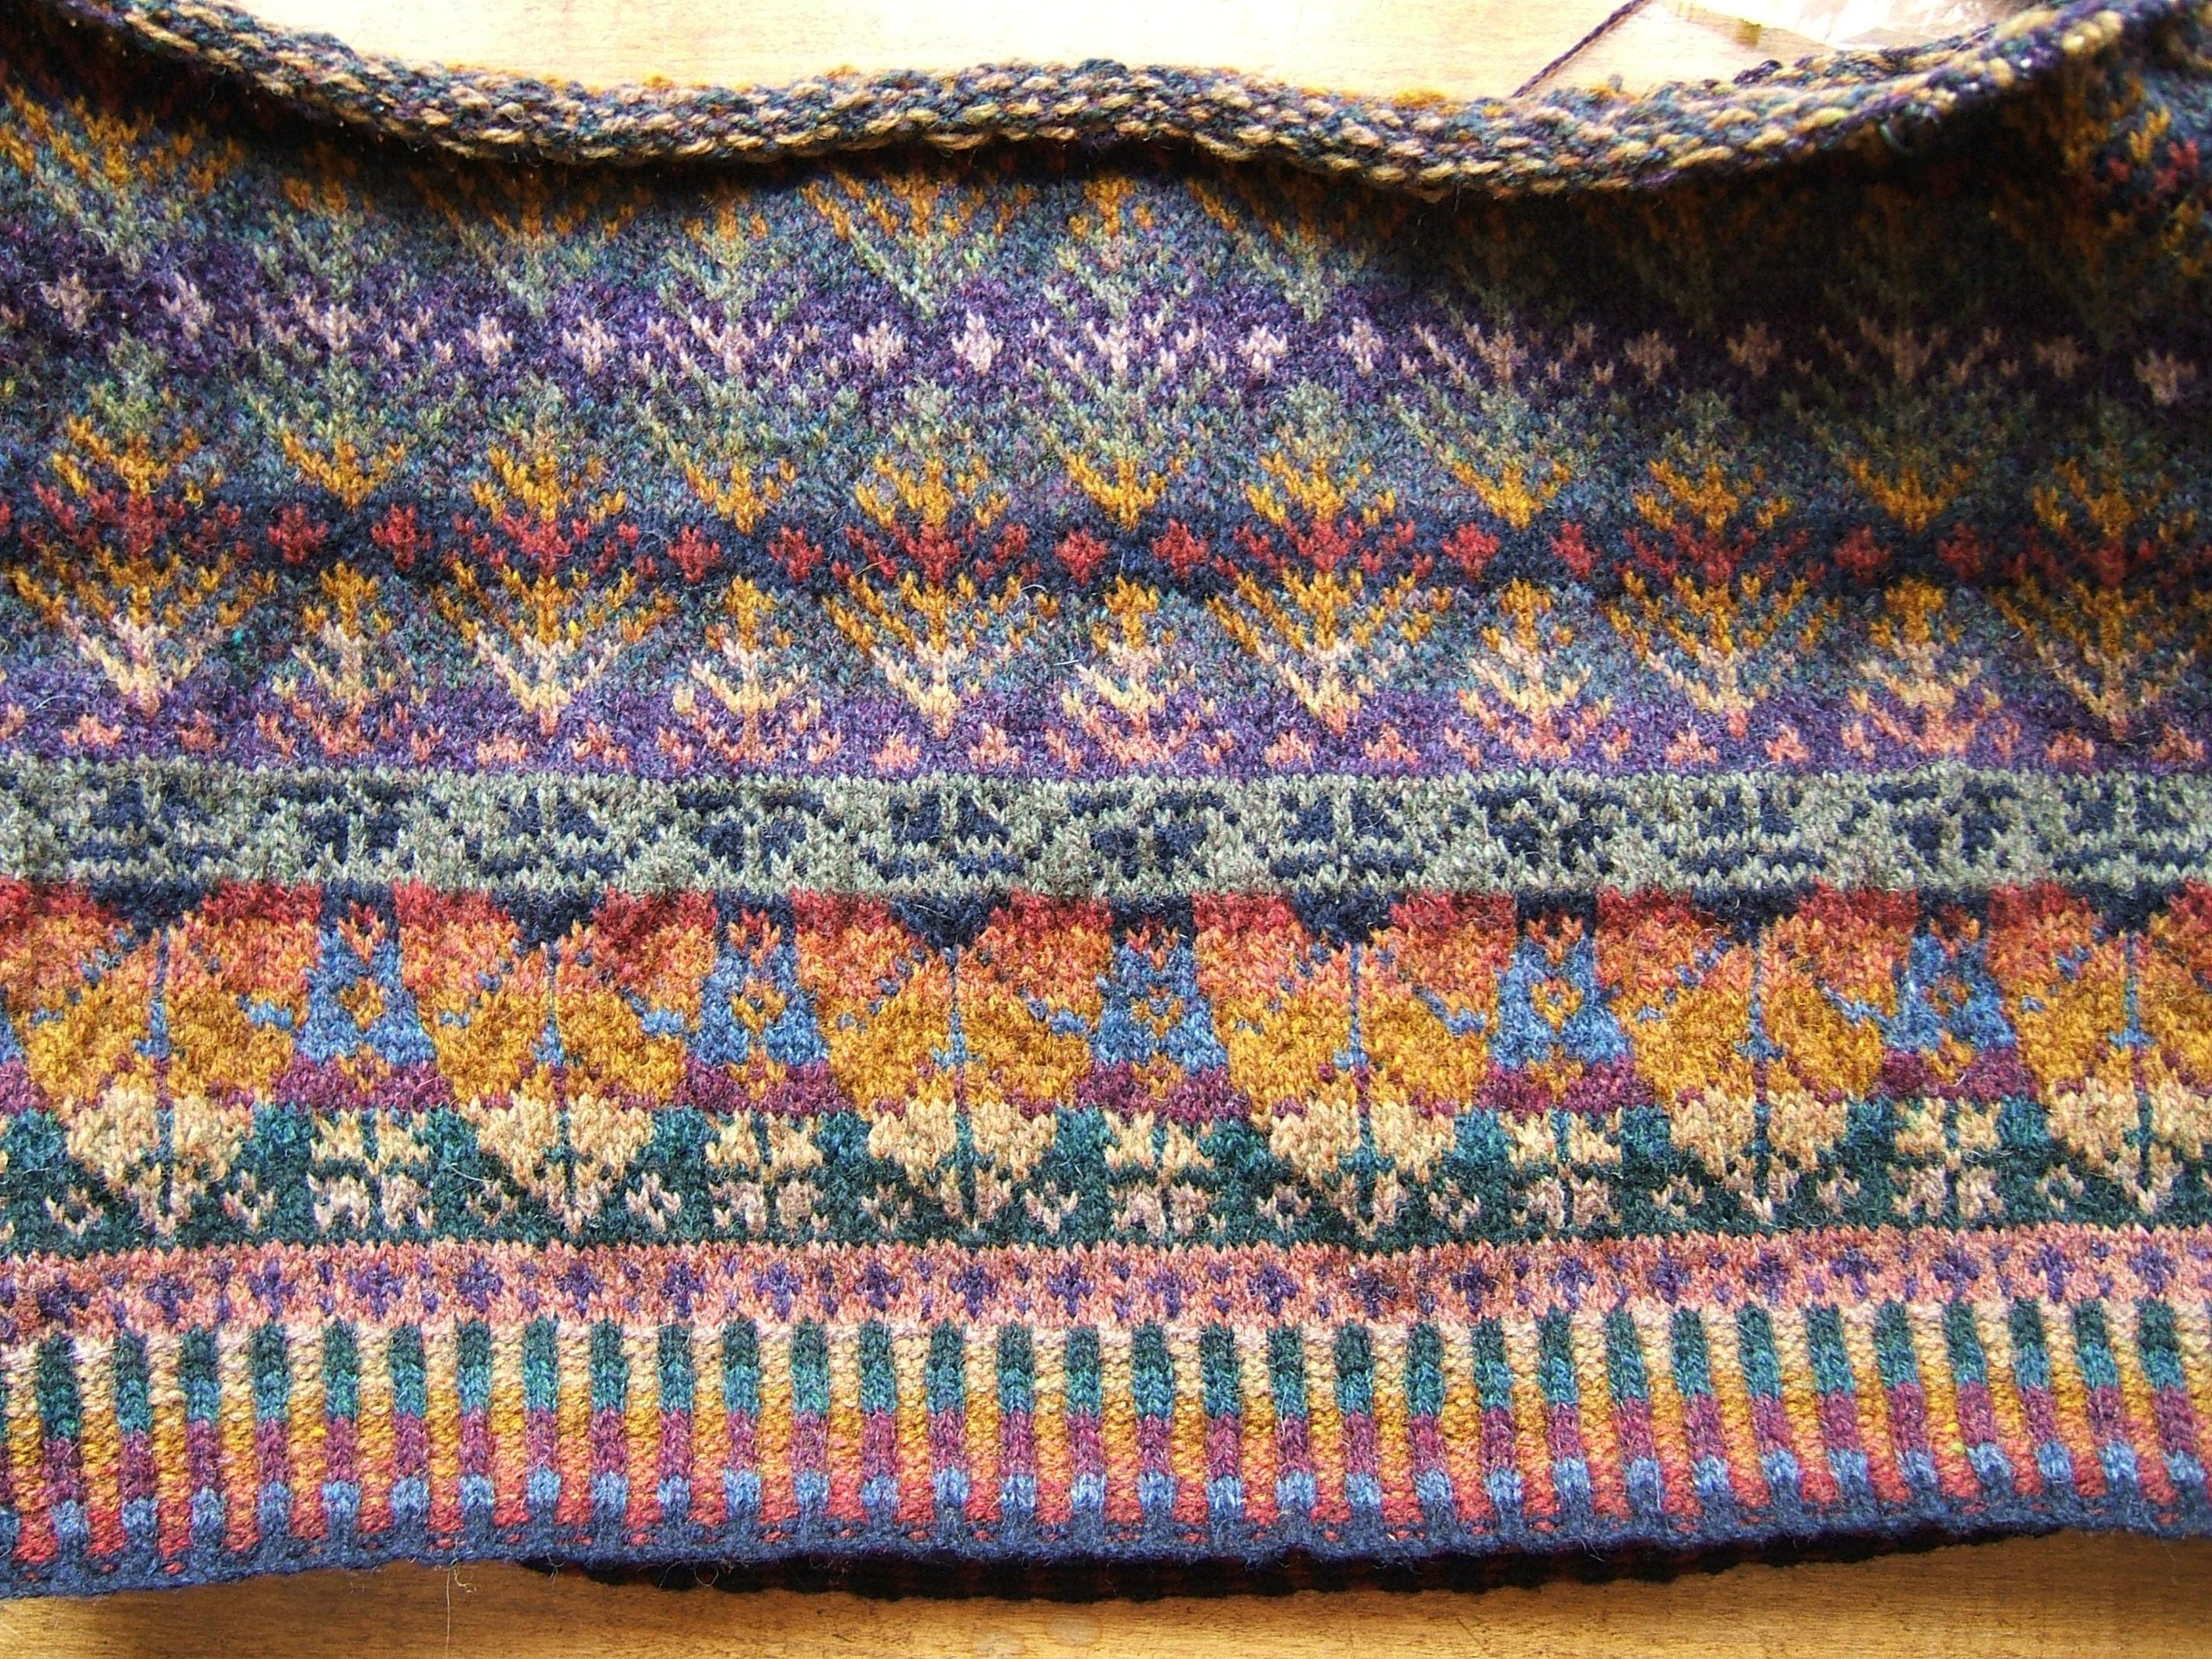 fair isle knitting FIBXYSY